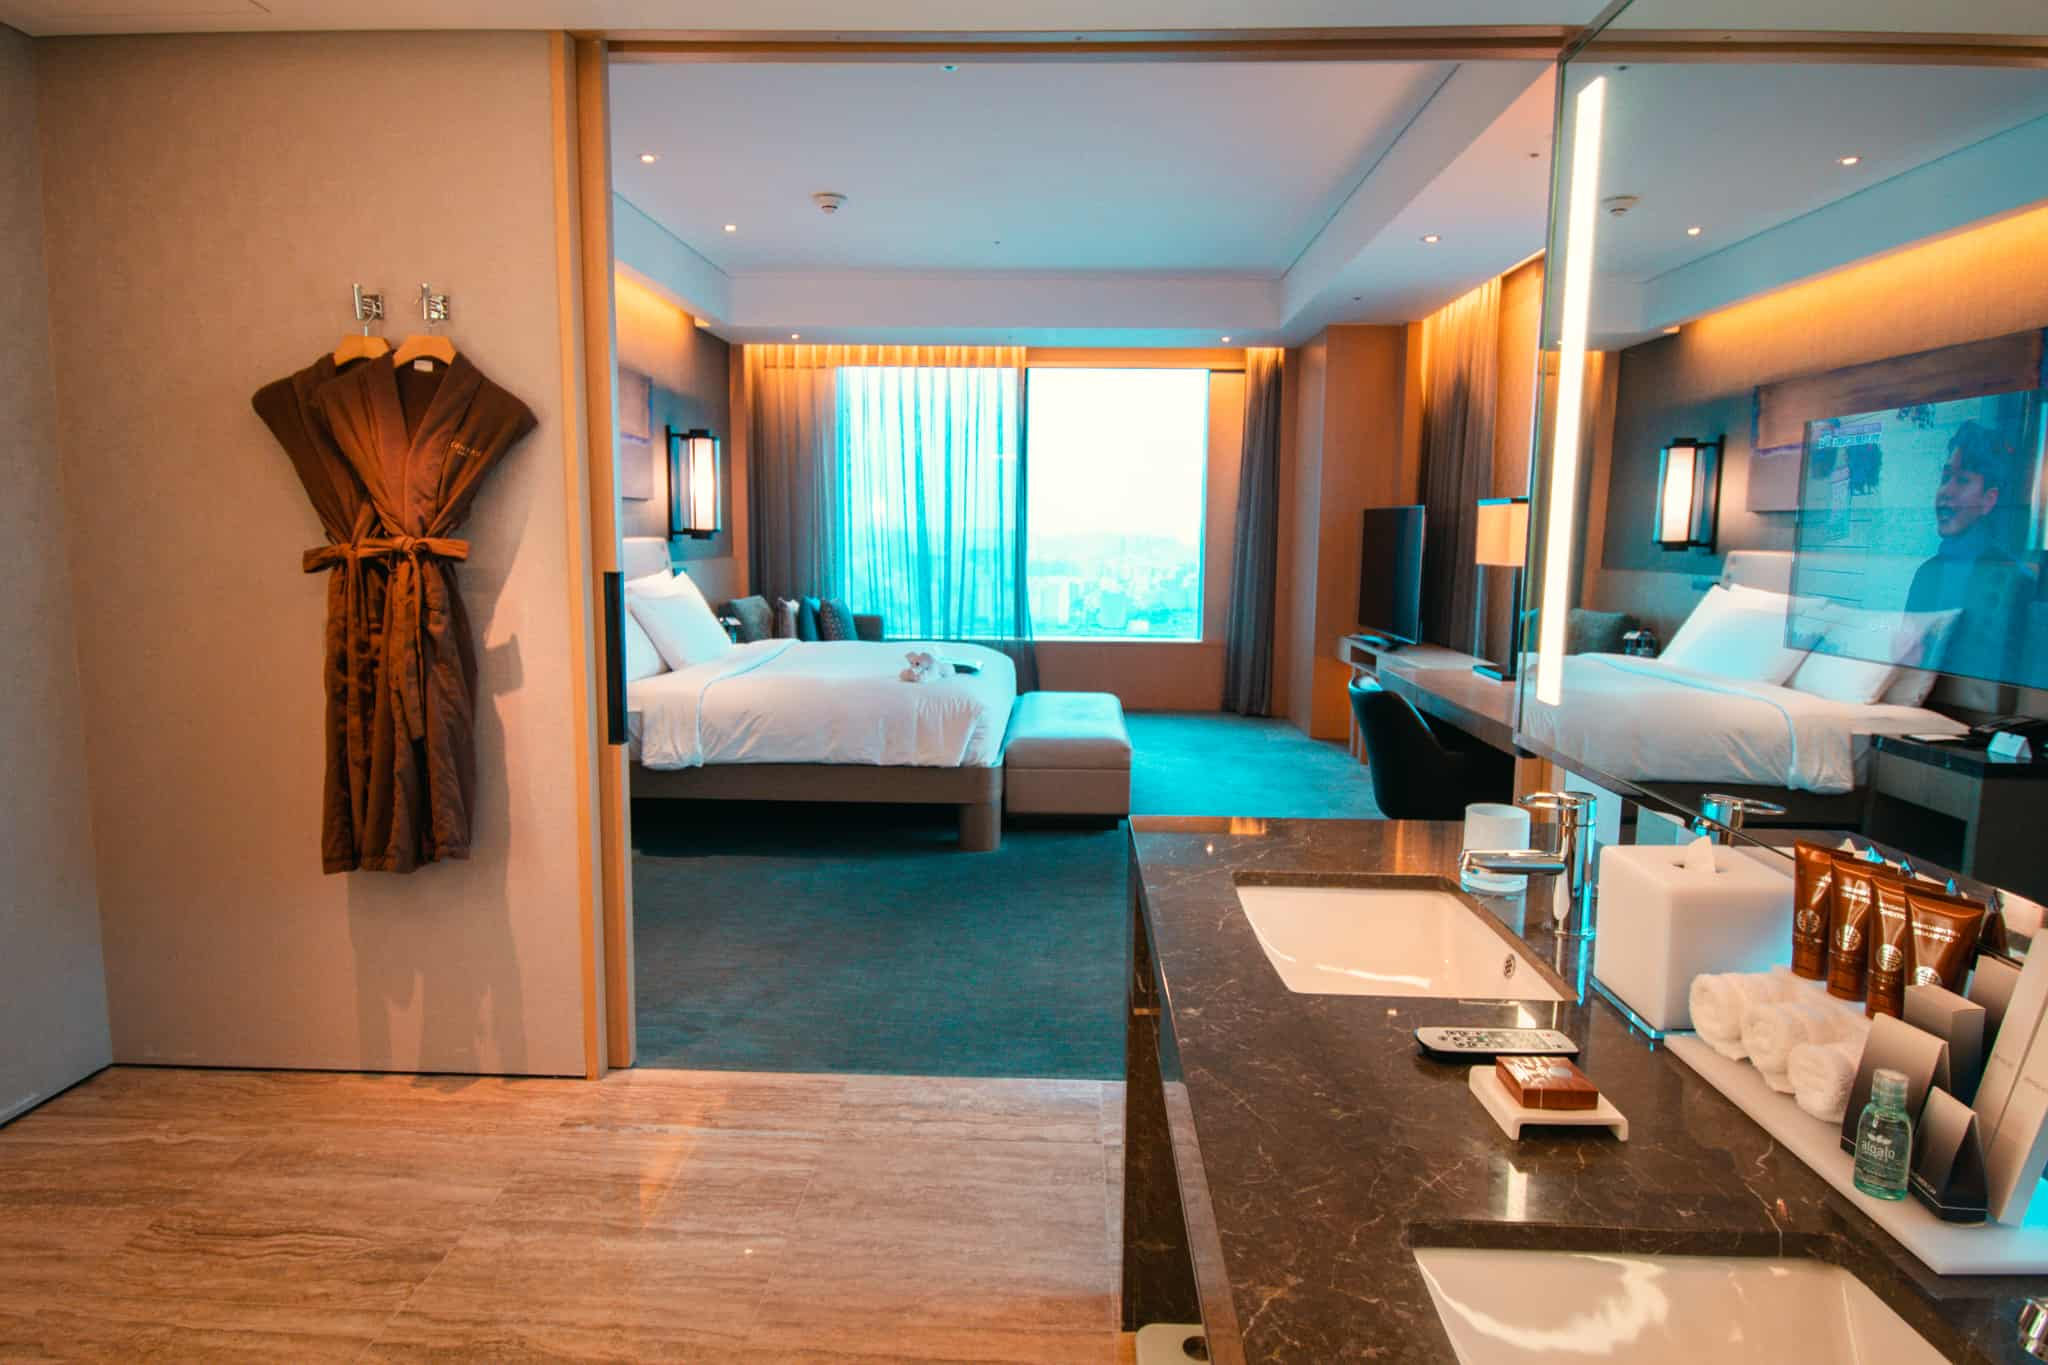 conrad-seoul-executive-suite